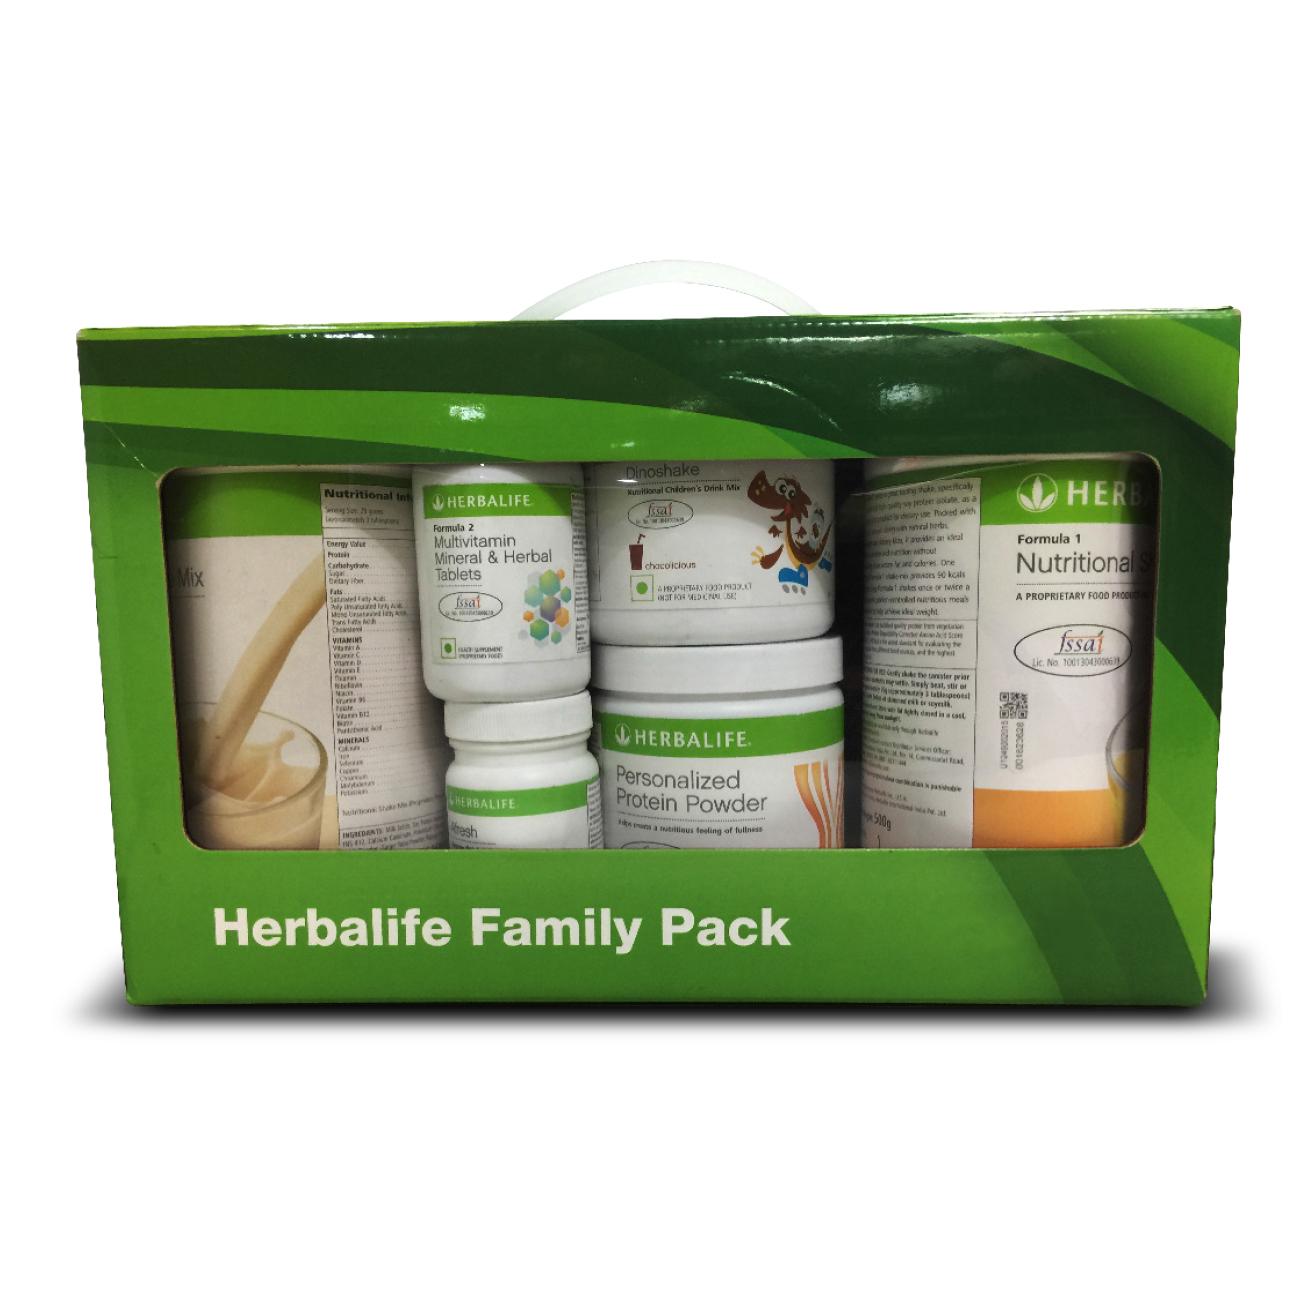 Herbalife Family Pack